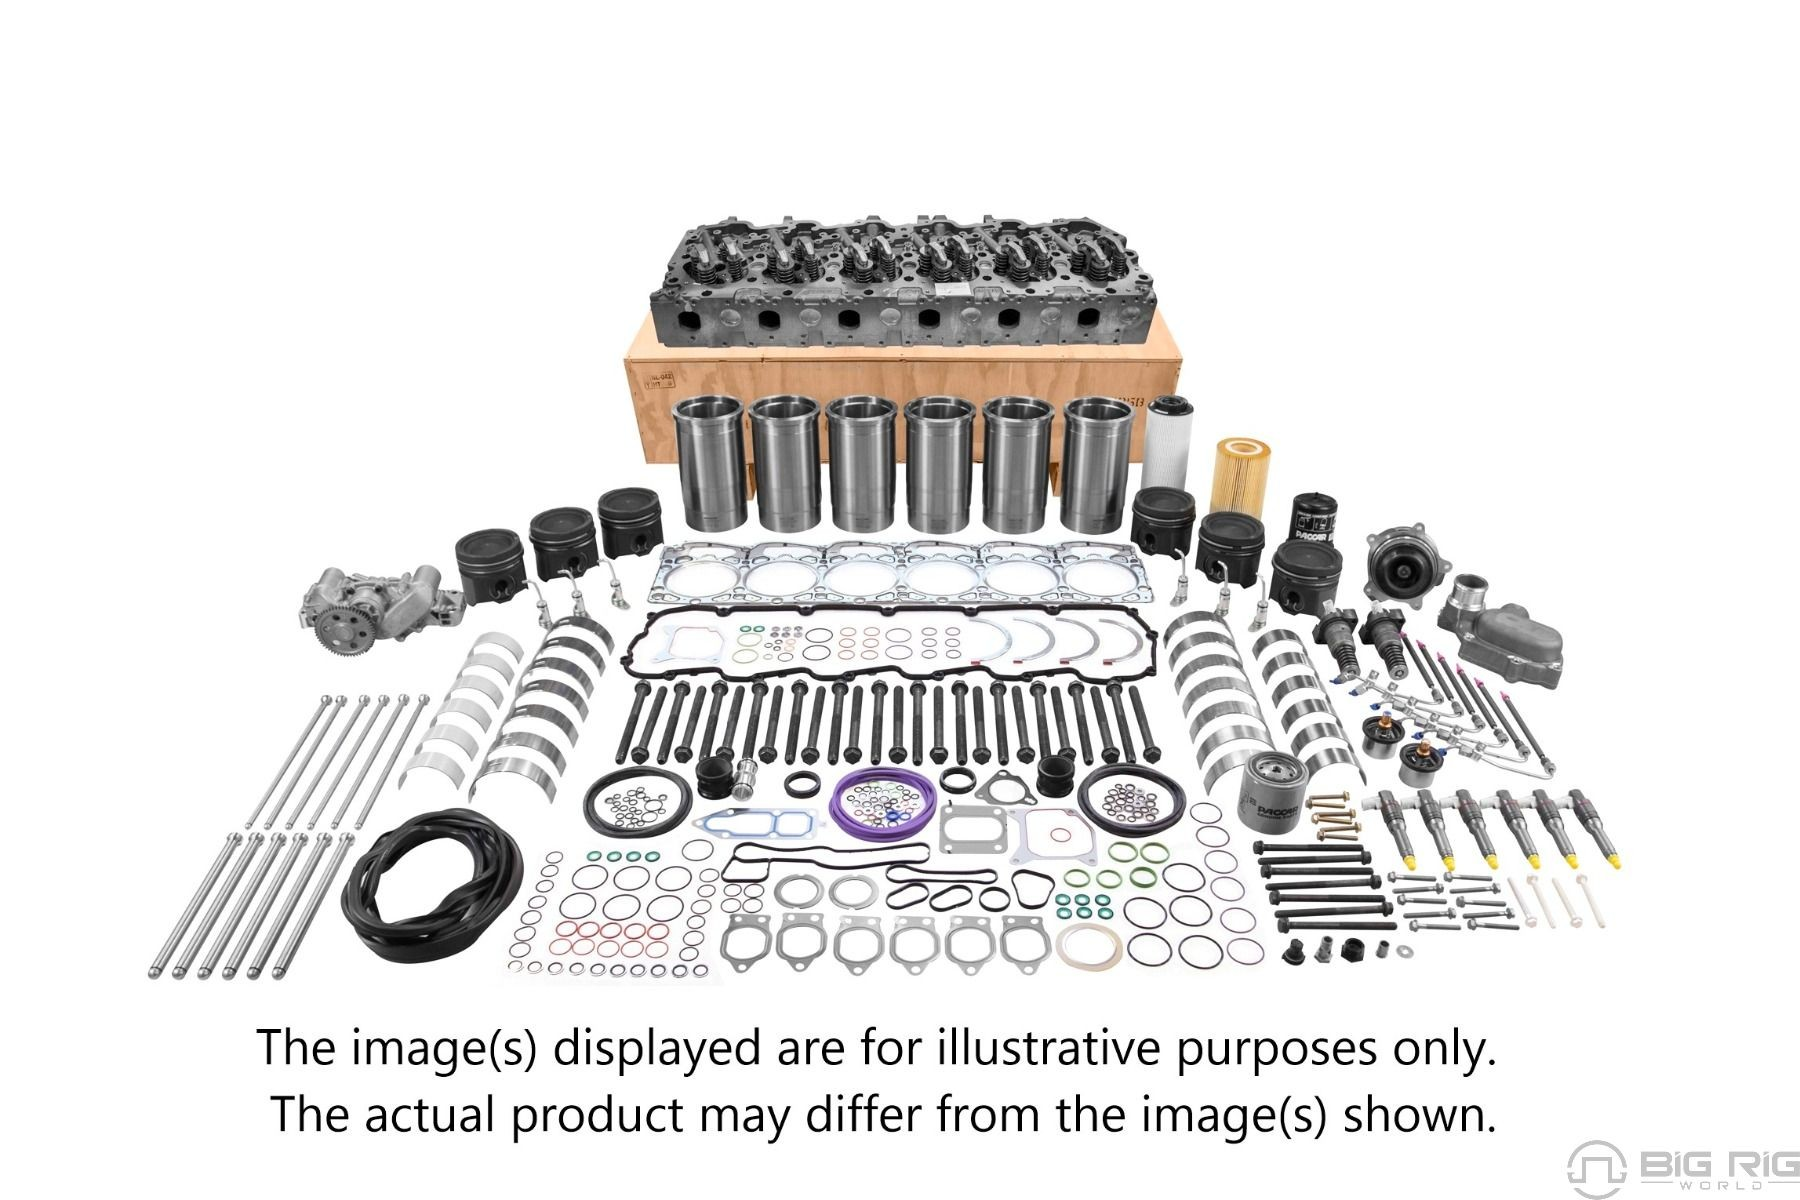 Paccar Mx13 Ecu Wiring Paccar Mx 13 Epa13 Engine Overhaul Kit My13 15a Level 2 Of Paccar Mx13 Ecu Wiring